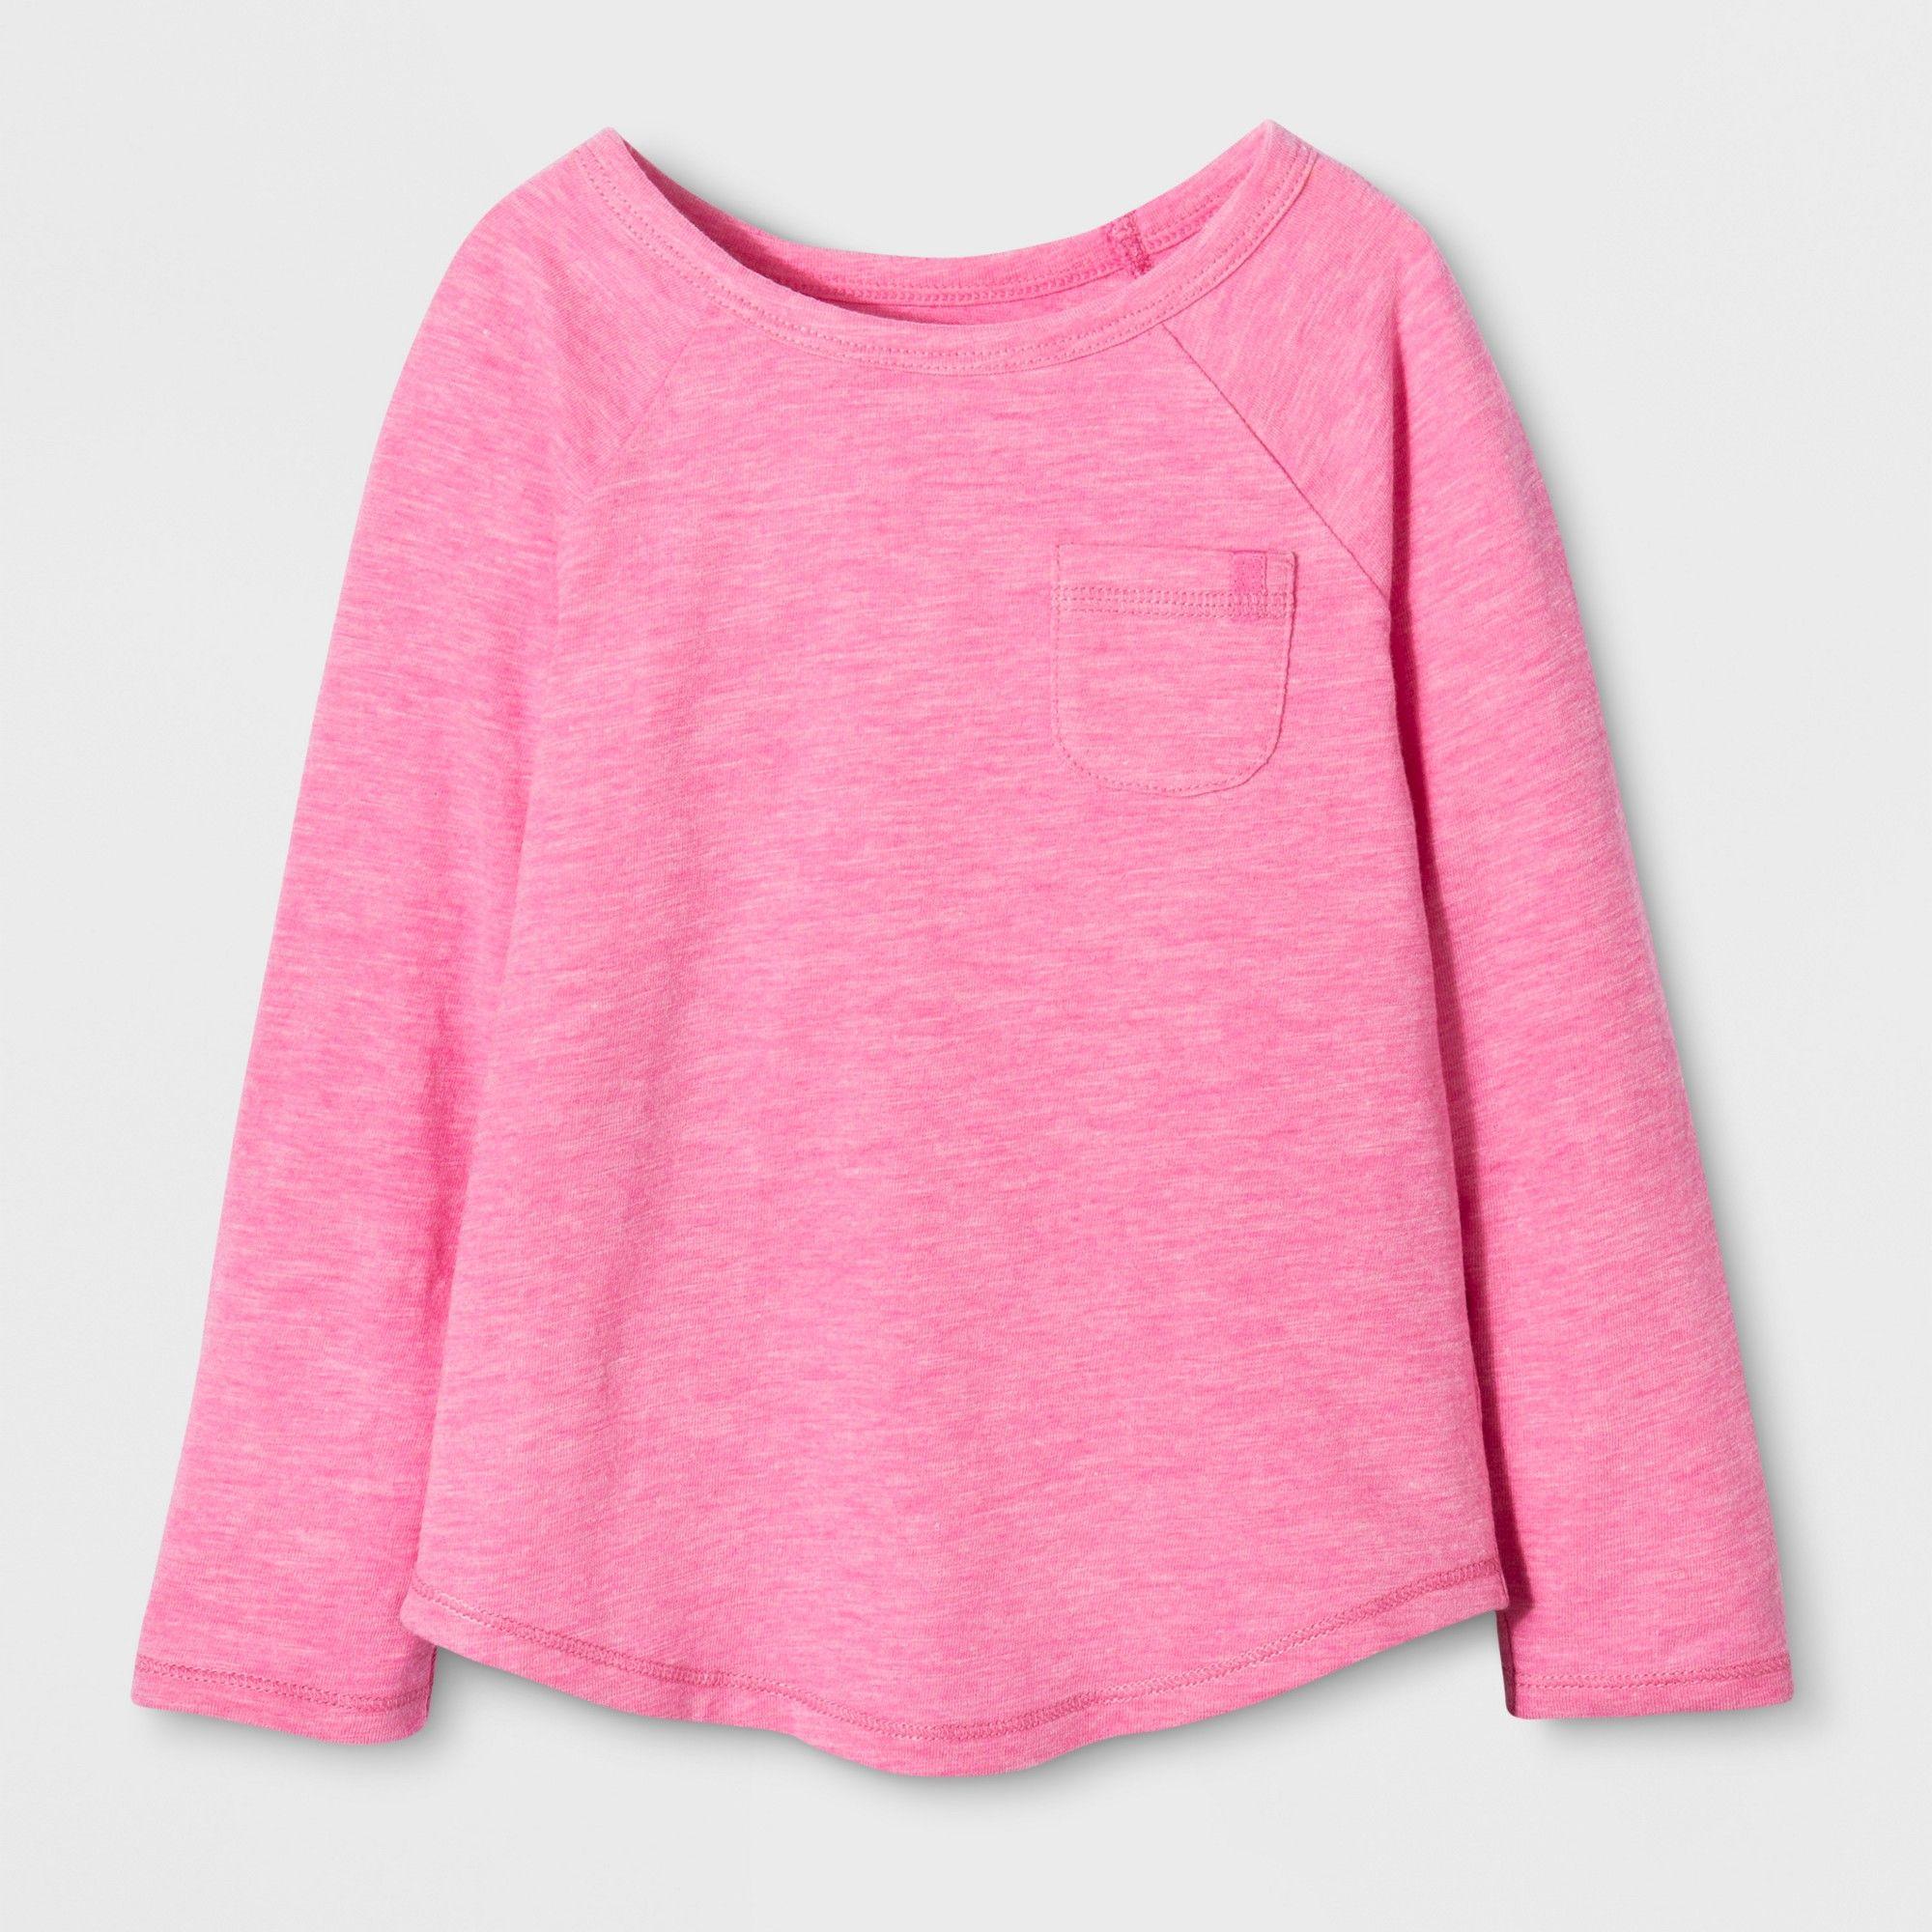 772eb71d28 Toddler Girl Black Long Sleeve Shirt - Ortsplanungsrevision Stadt Thun